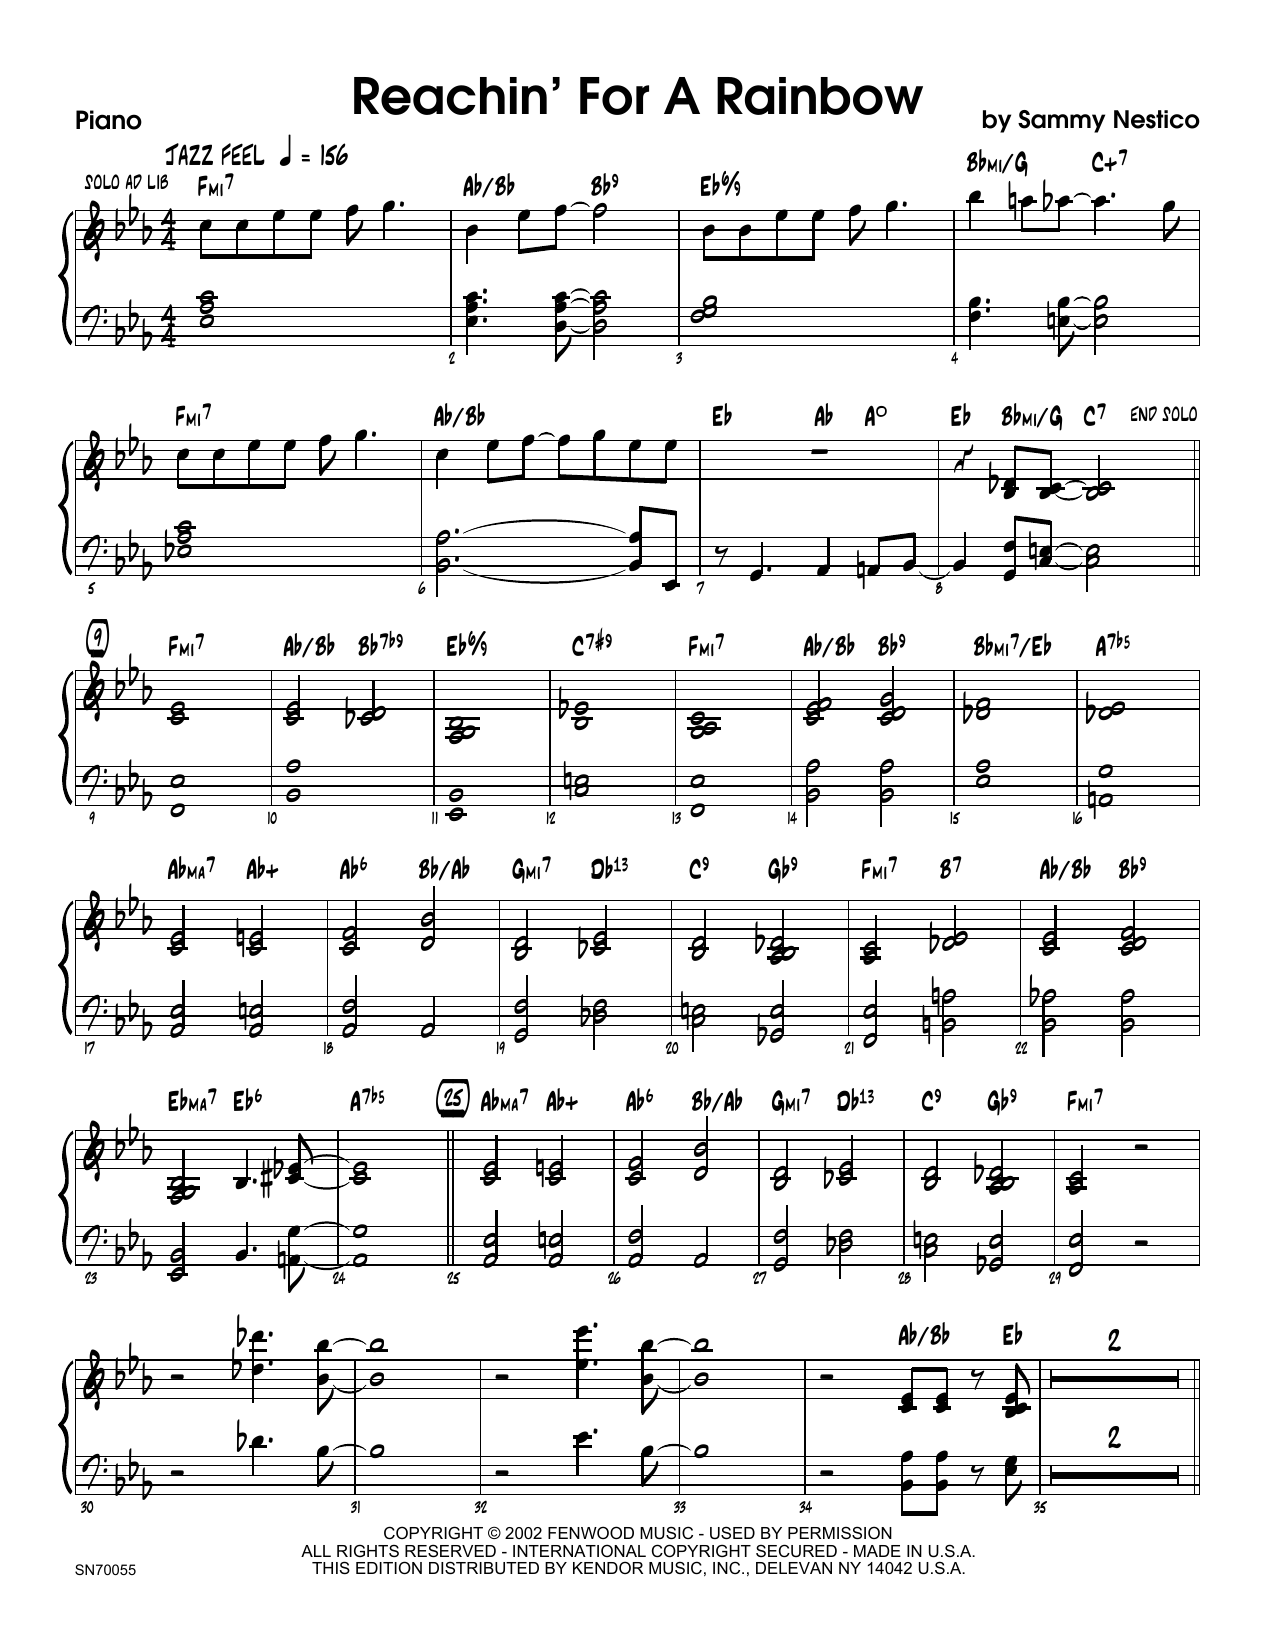 Reachin' For A Rainbow - Piano Sheet Music